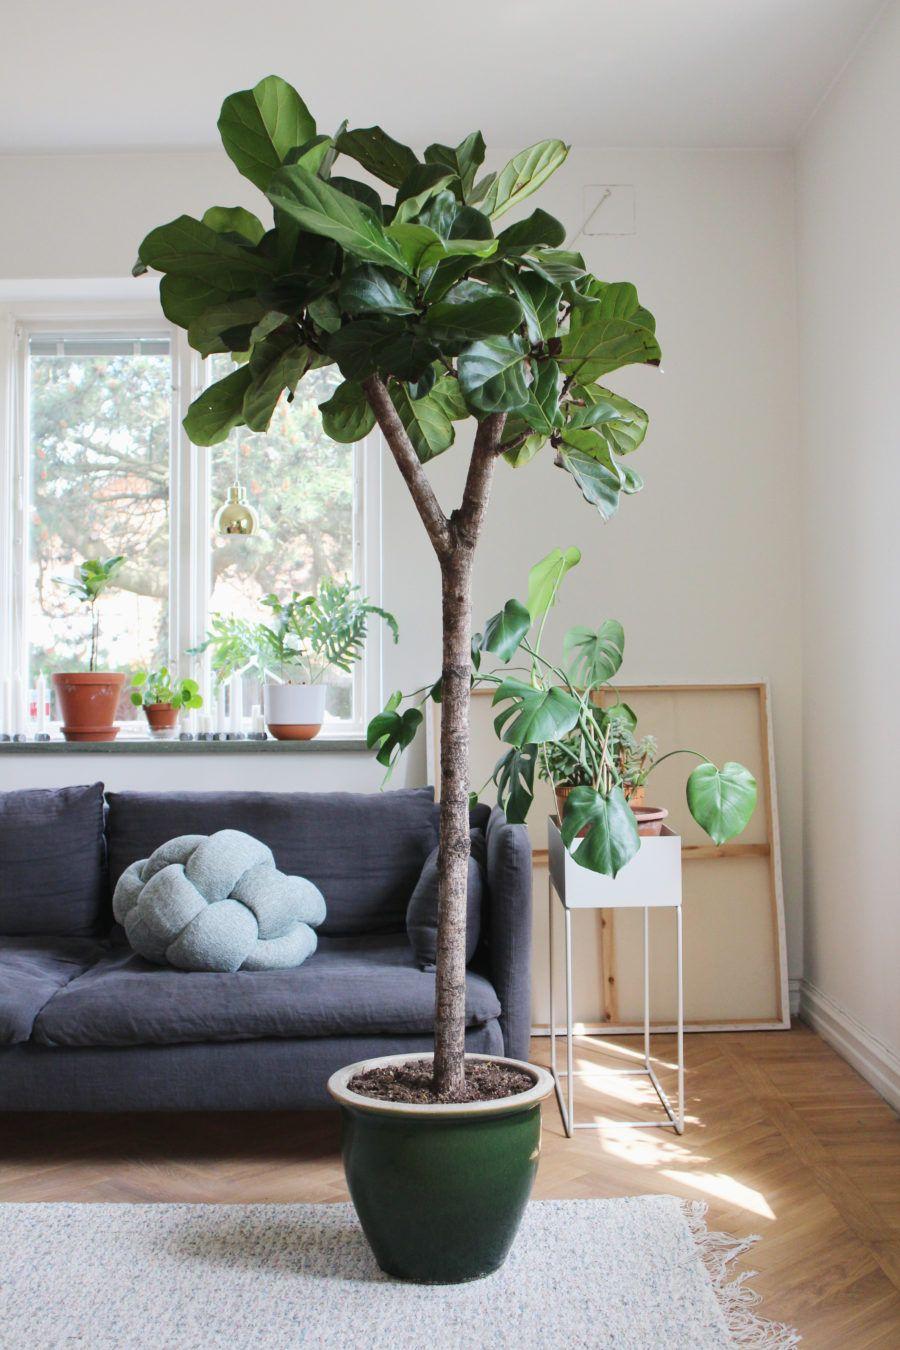 historien om v rt inomhustr d pinterest plantes idee deco table et plante interieur. Black Bedroom Furniture Sets. Home Design Ideas